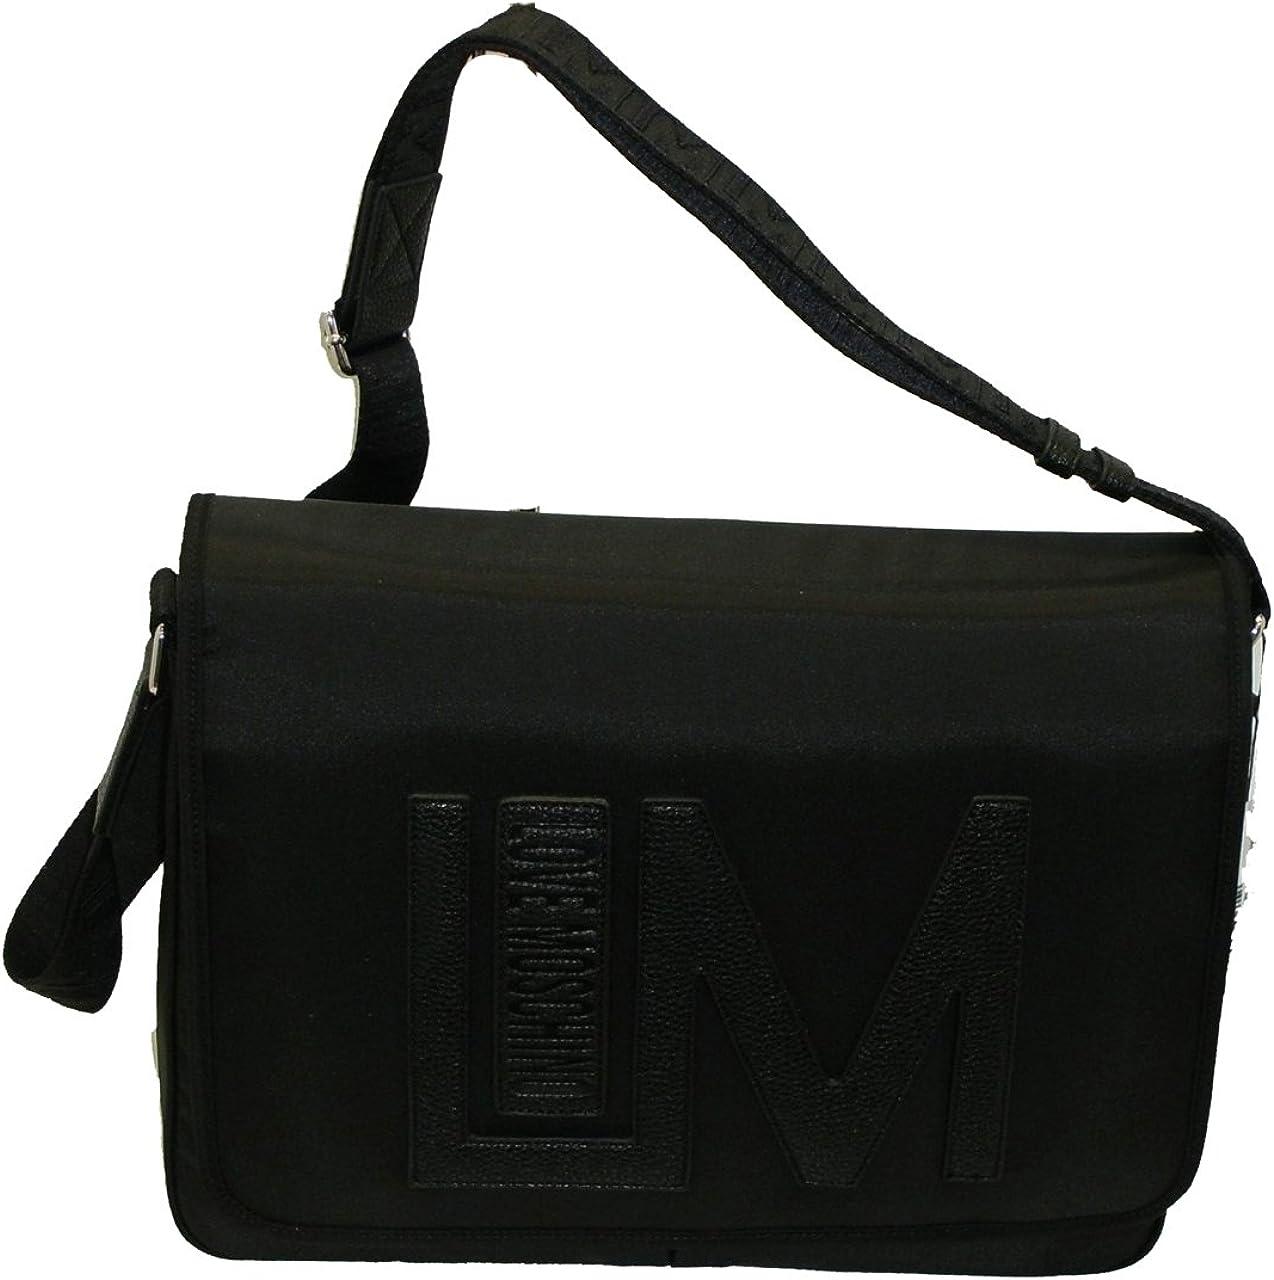 Bolso de hombre Moschino Love MESSENGER JD4711 negro: Amazon